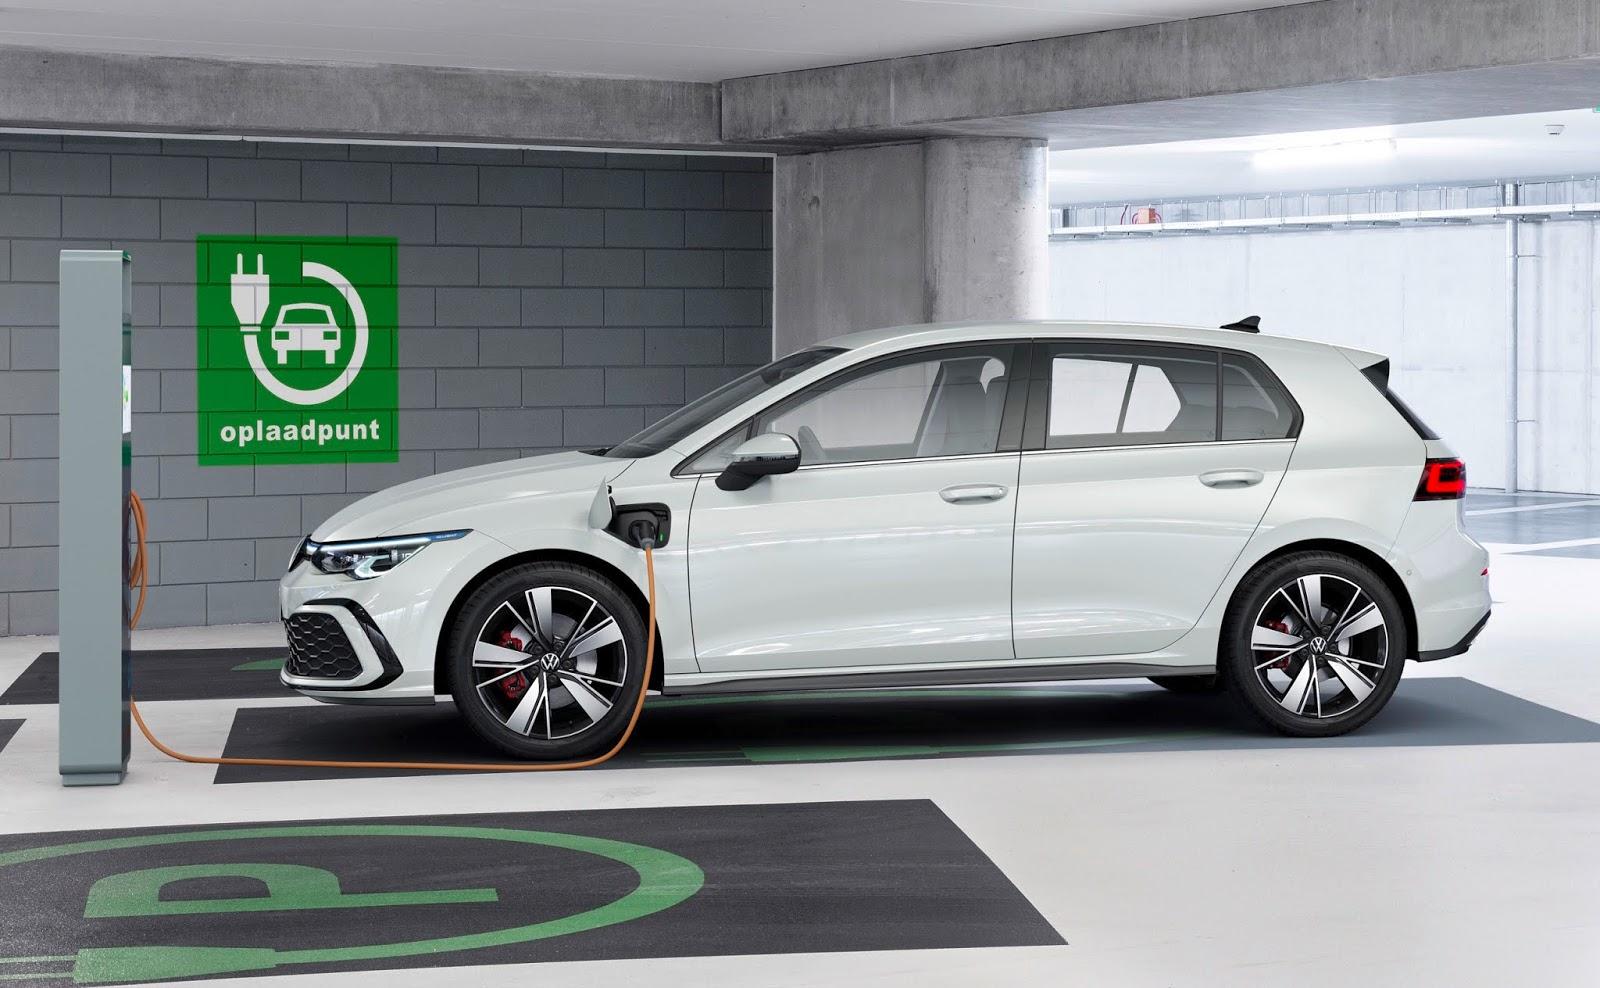 VOLKSWAGEN2BGOLF2BGTE Volkswagen : Κυρίαρχη στην ηλεκτροκίνηση το 2021 Electric cars, electric vehicles, Hybrid, plug-in hybrid, Volkswagen, zblog, ειδήσεις, ηλεκτρικά, ηλεκτροκινηση, υβριδικό